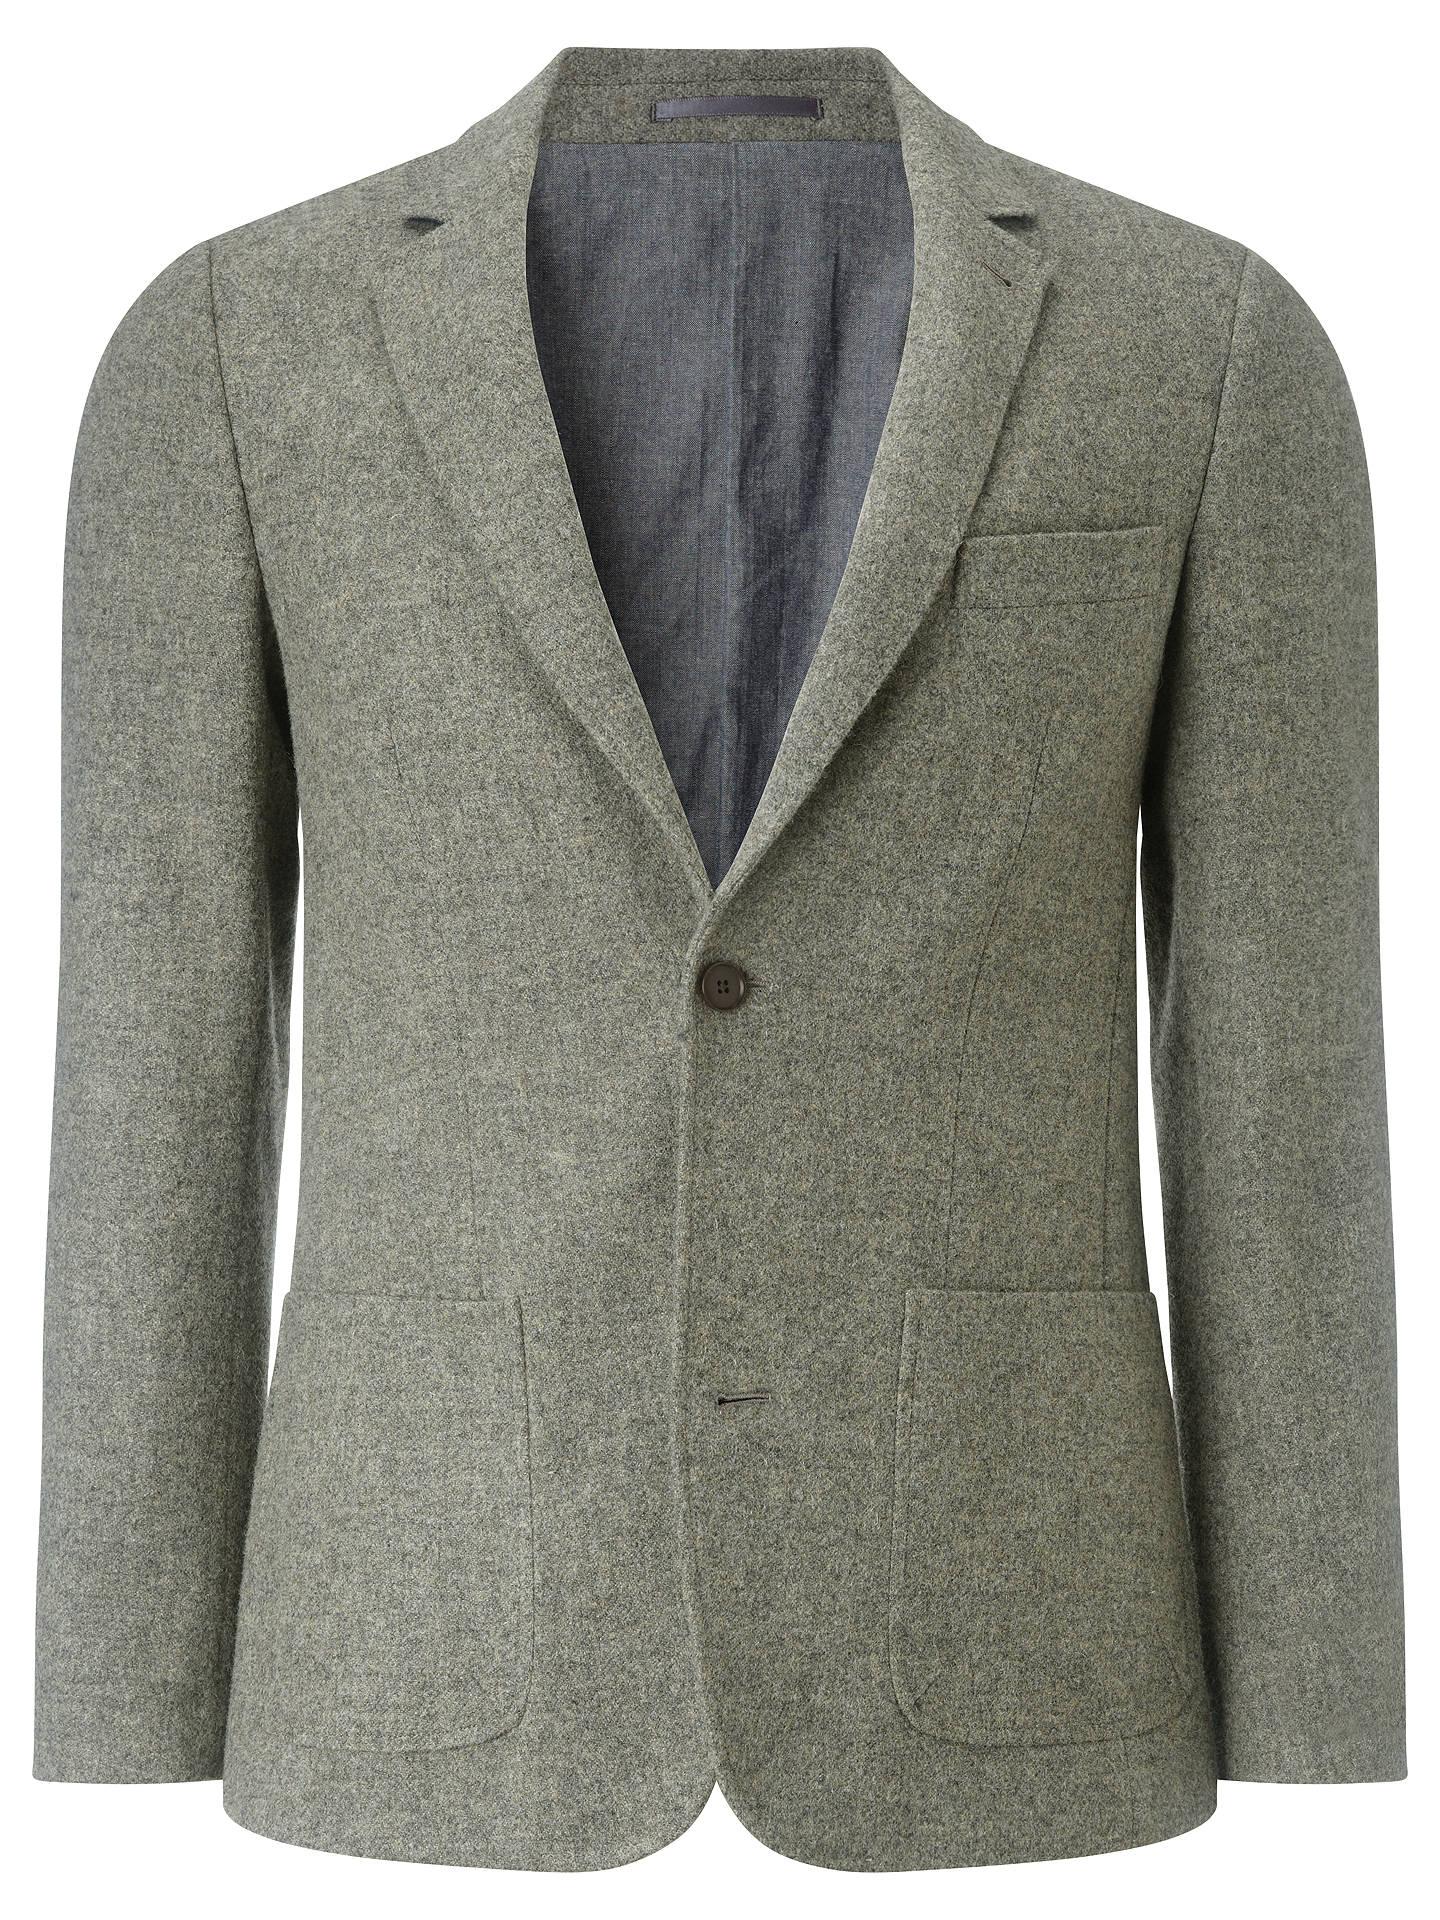 9e2b39c74289 JOHN LEWIS   Co. Abraham Moon Wool Deconstructed Blazer, Natural at ...